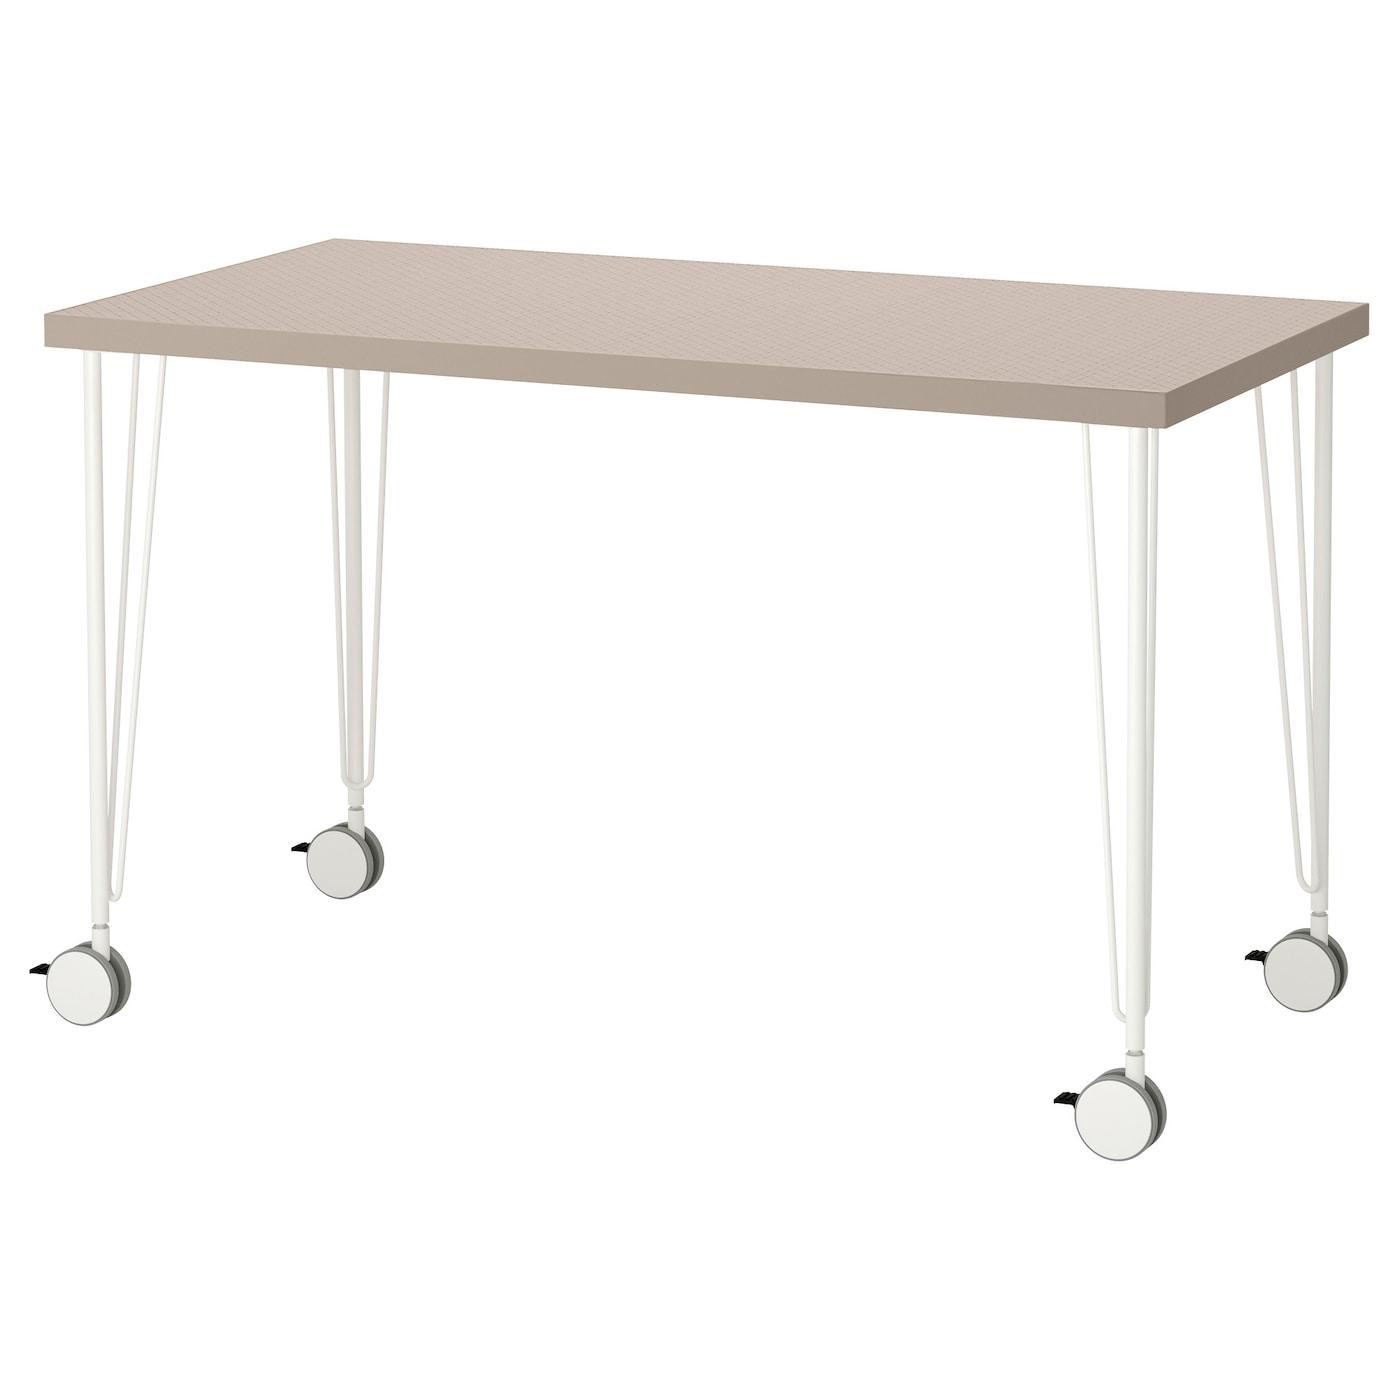 Krille linnmon table geometric beige white 120x60 cm ikea for Table 70x140